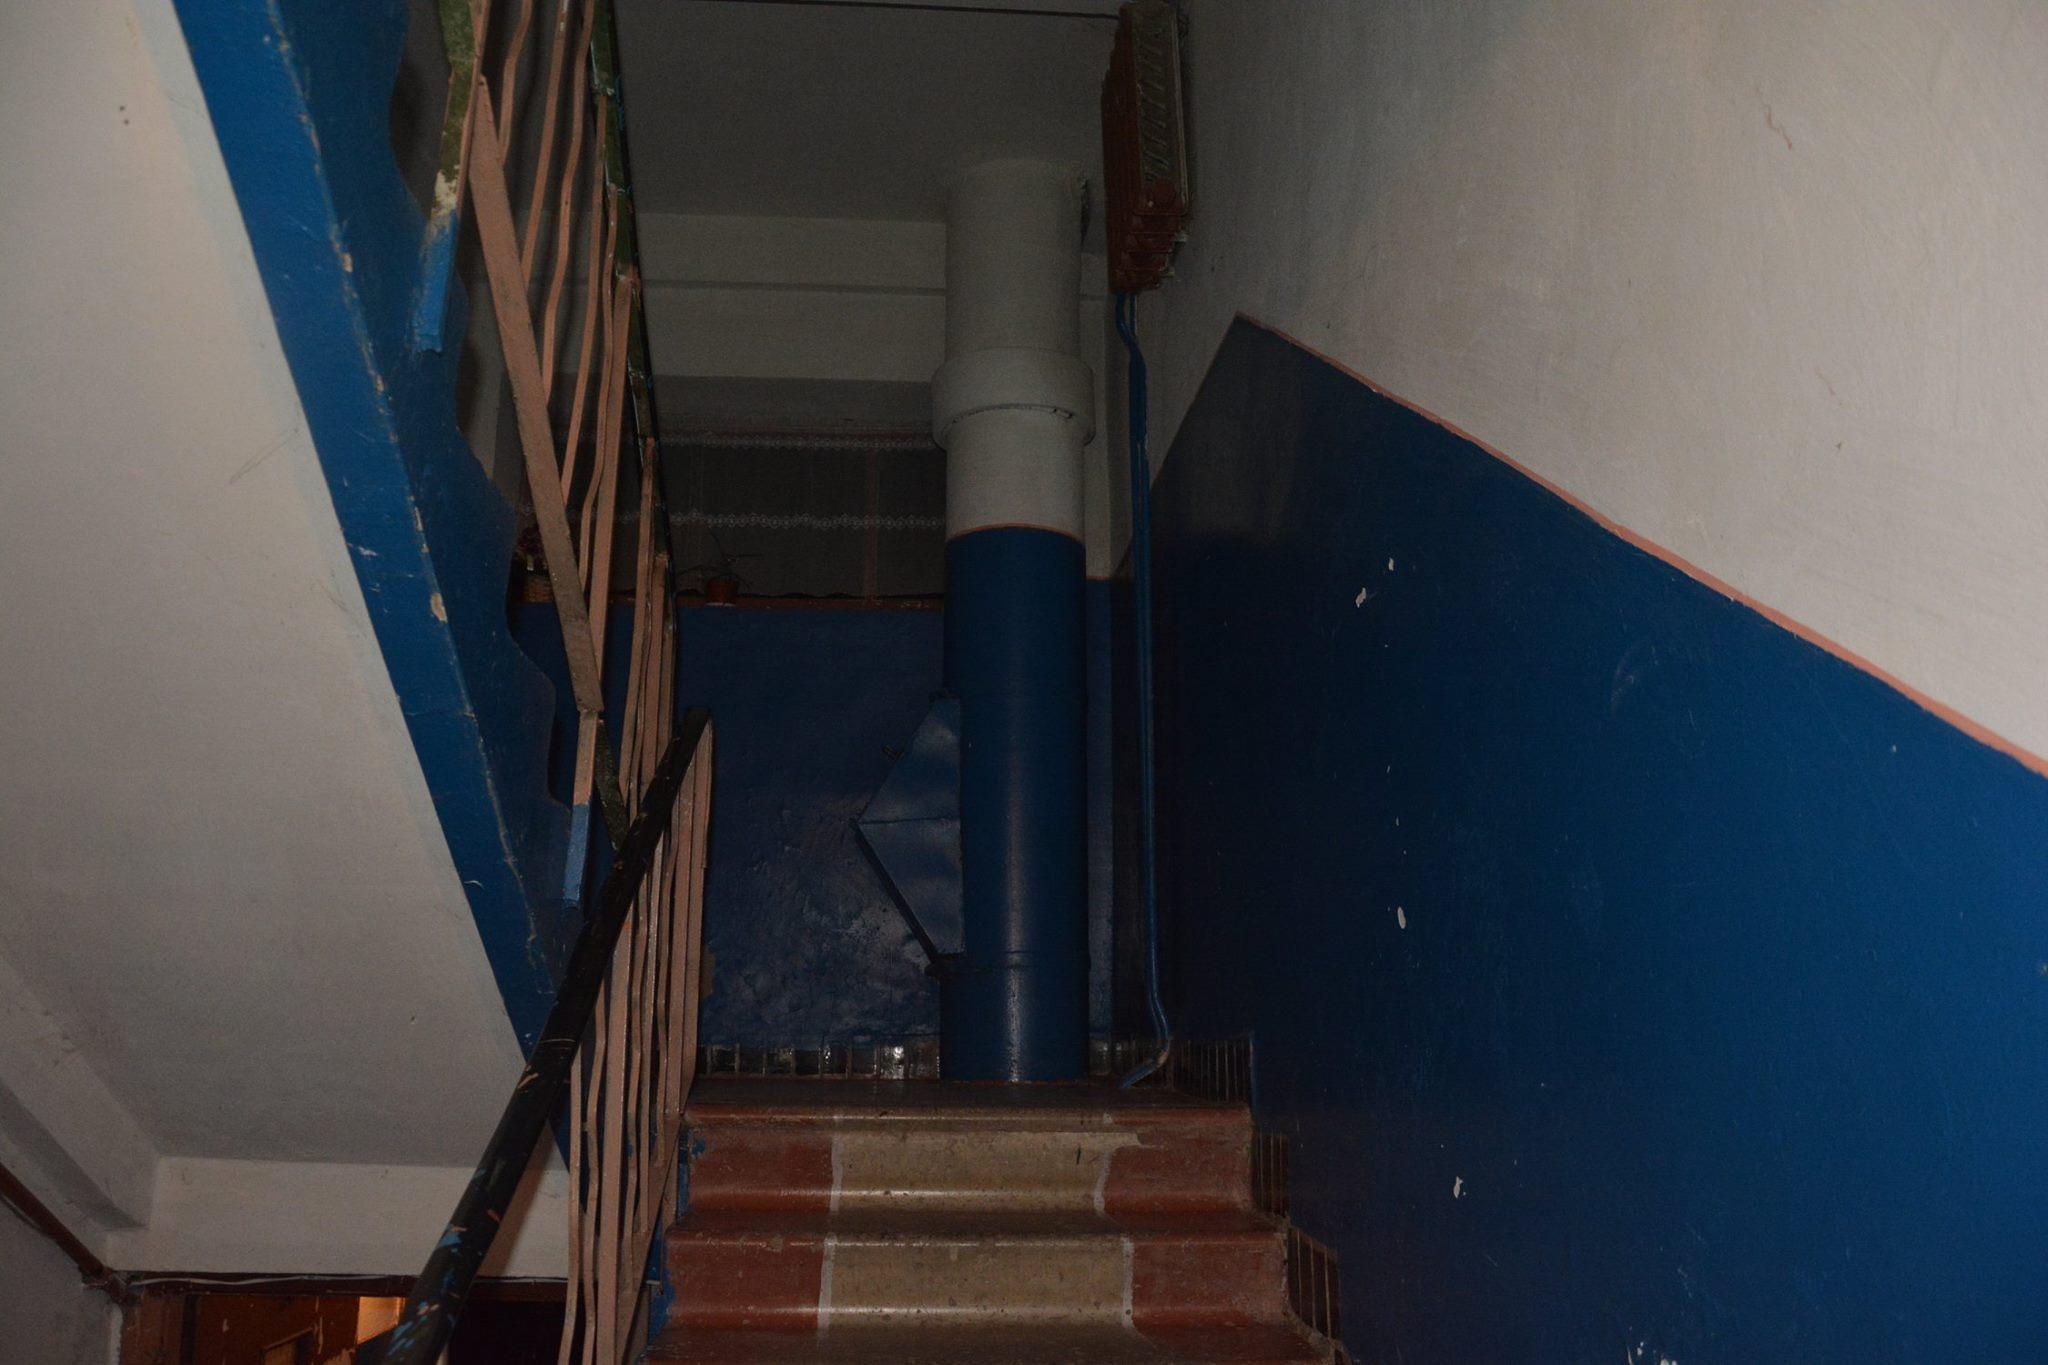 В Мукачево убили 27-летнего парня: умер от колото-резаных ран